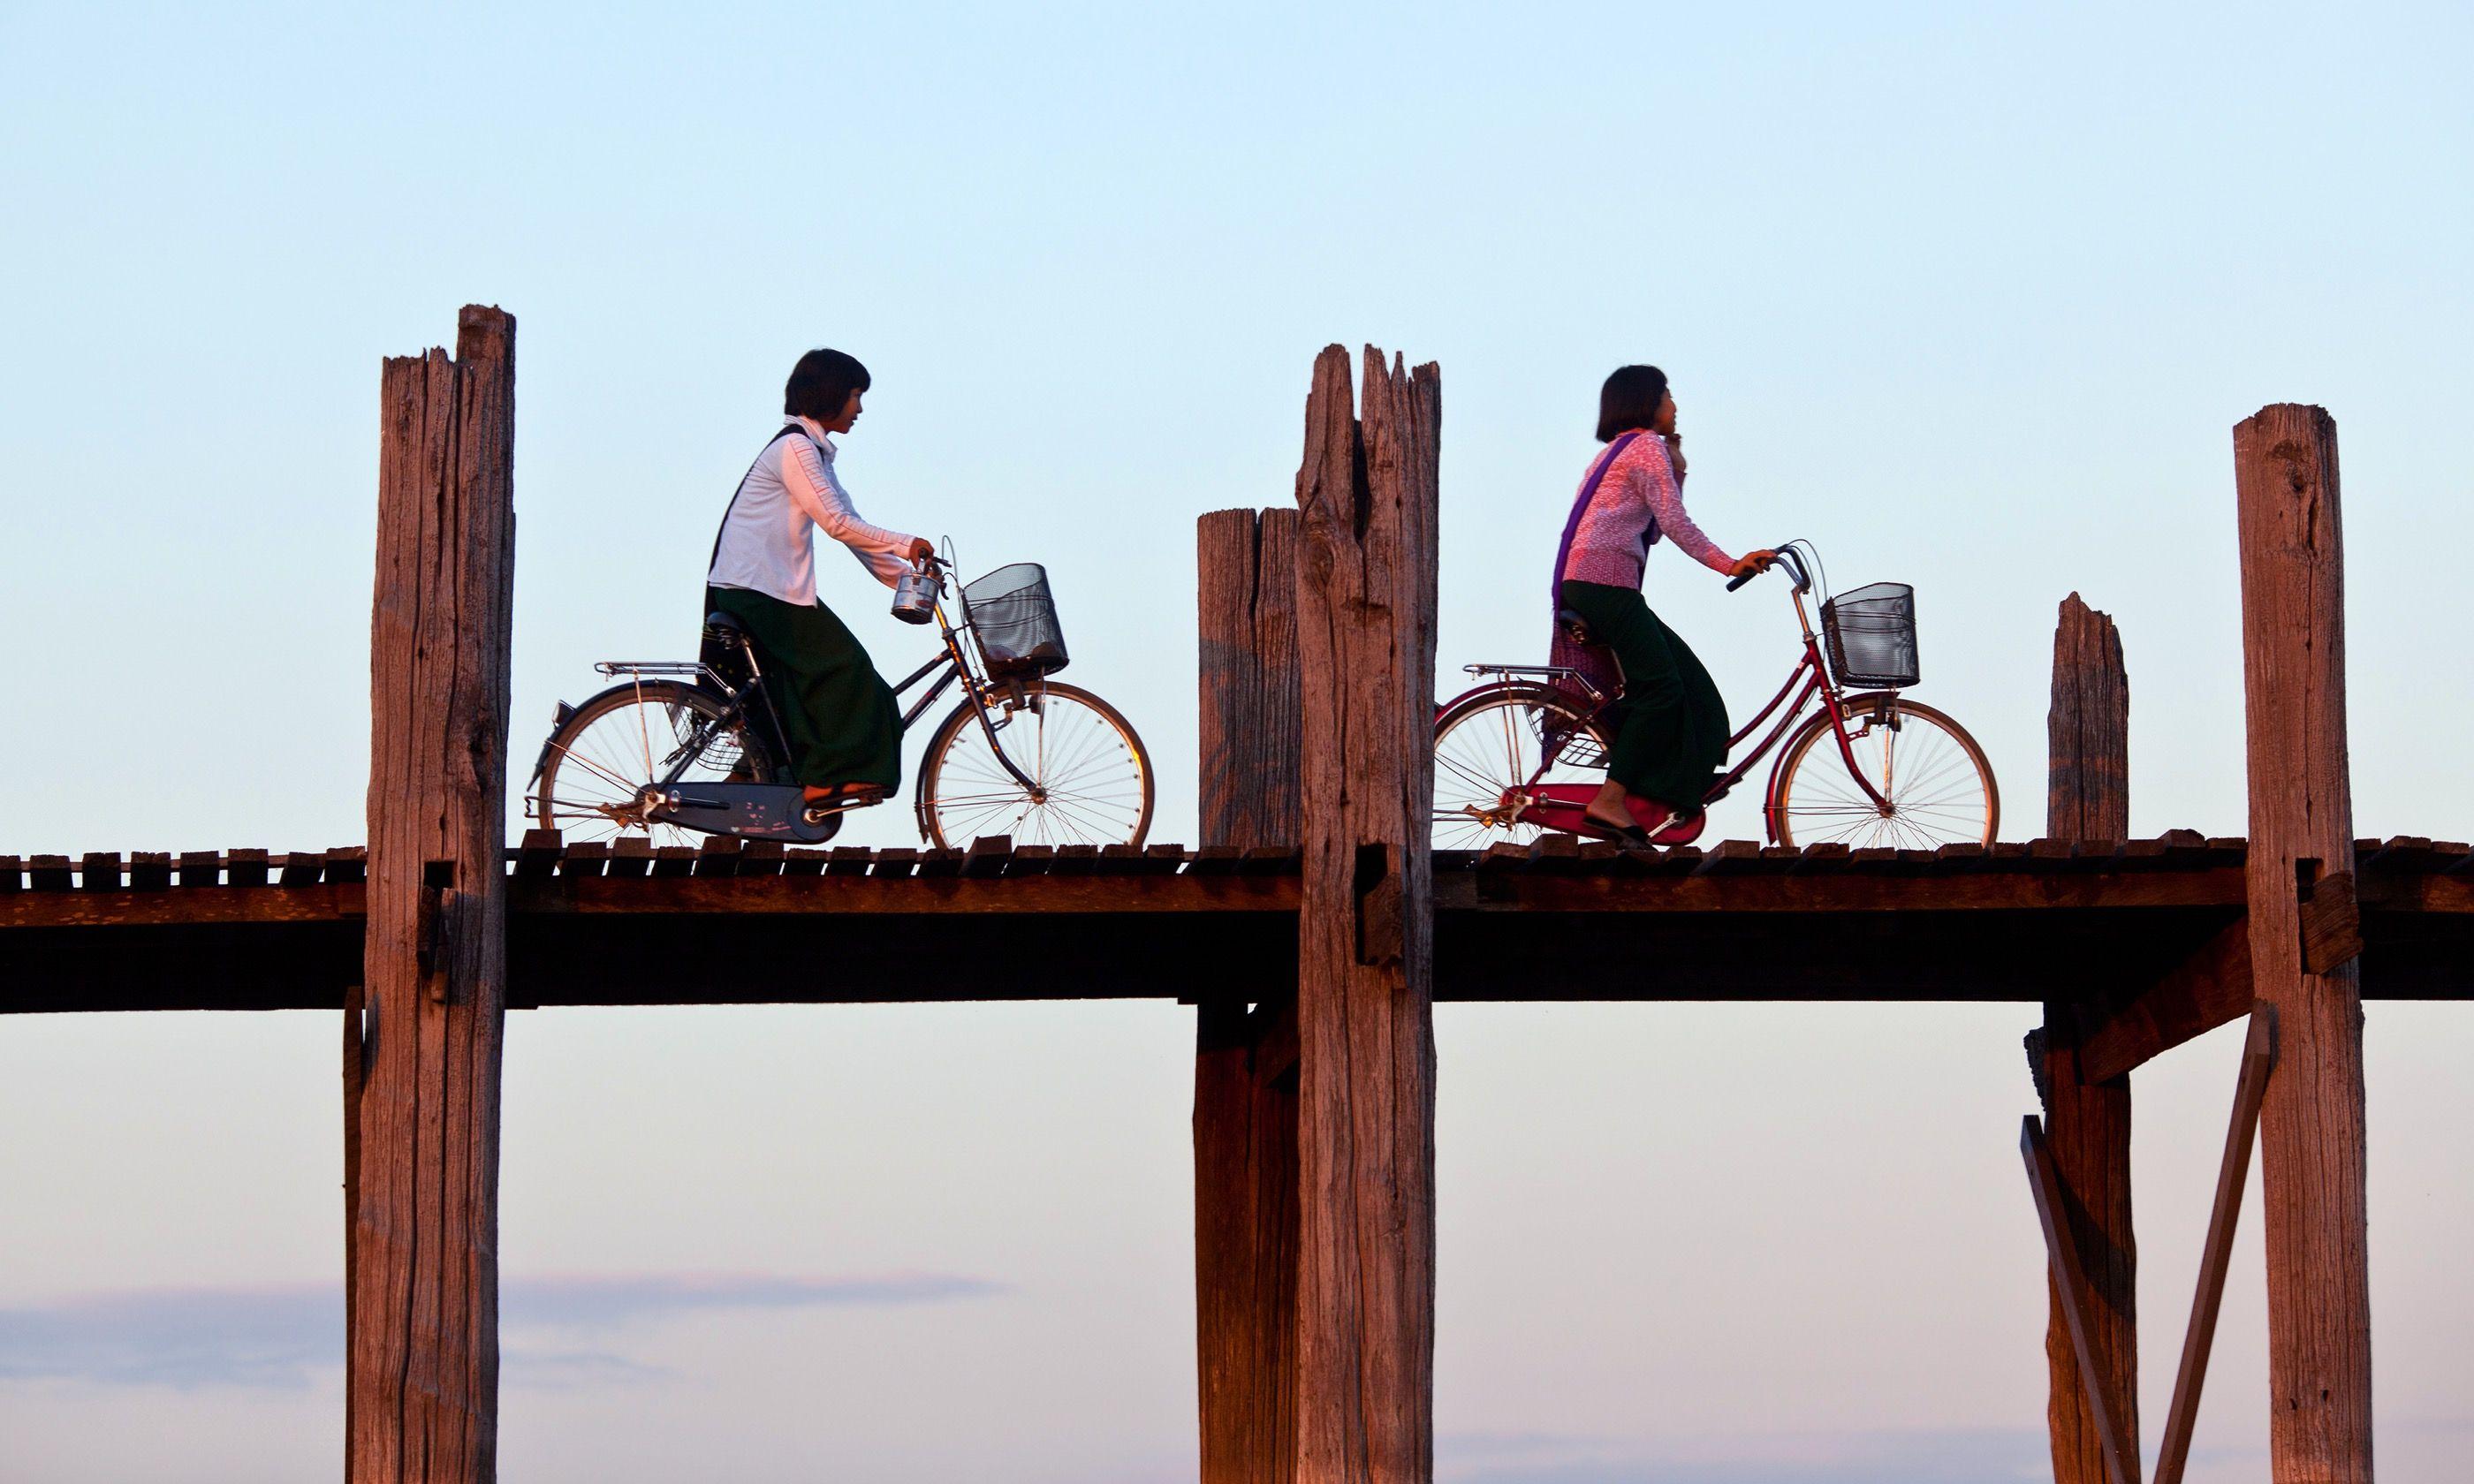 Cyclists on the U Been teak bridge (Dreamstime)